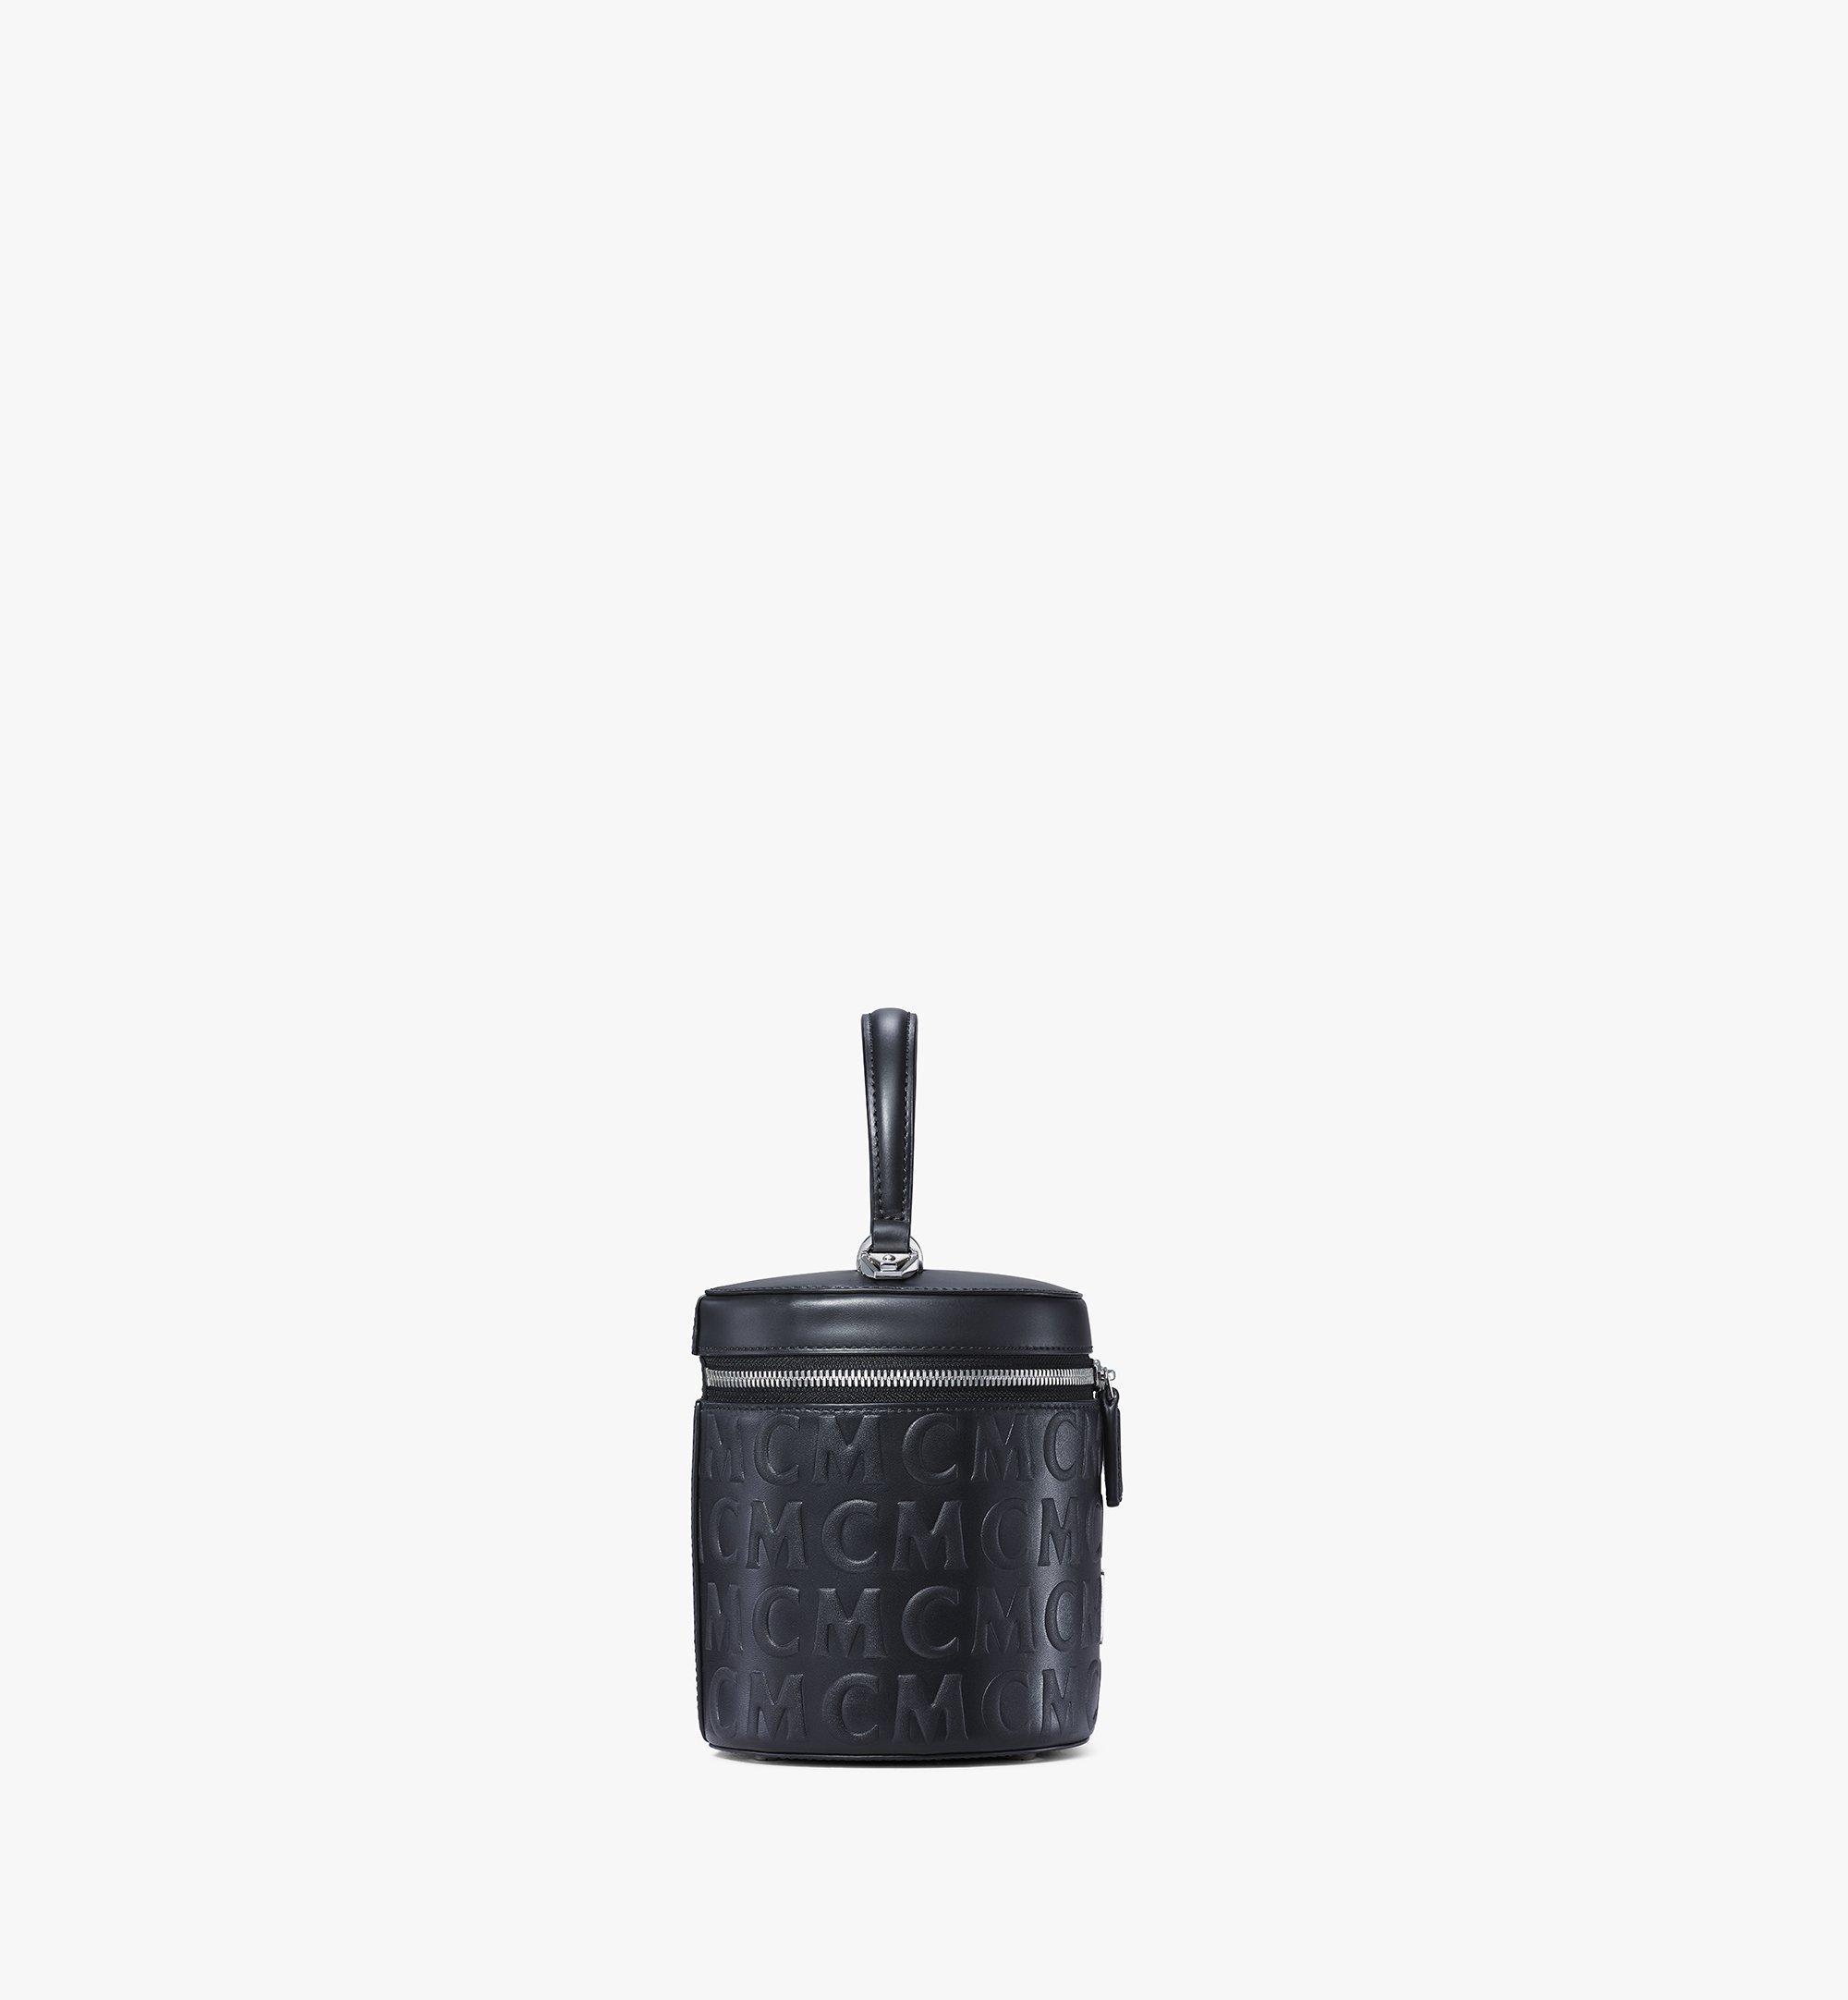 MCM Cylinder Crossbody in MCM Monogram Leather Black MWRAACG05BK001 Alternate View 1